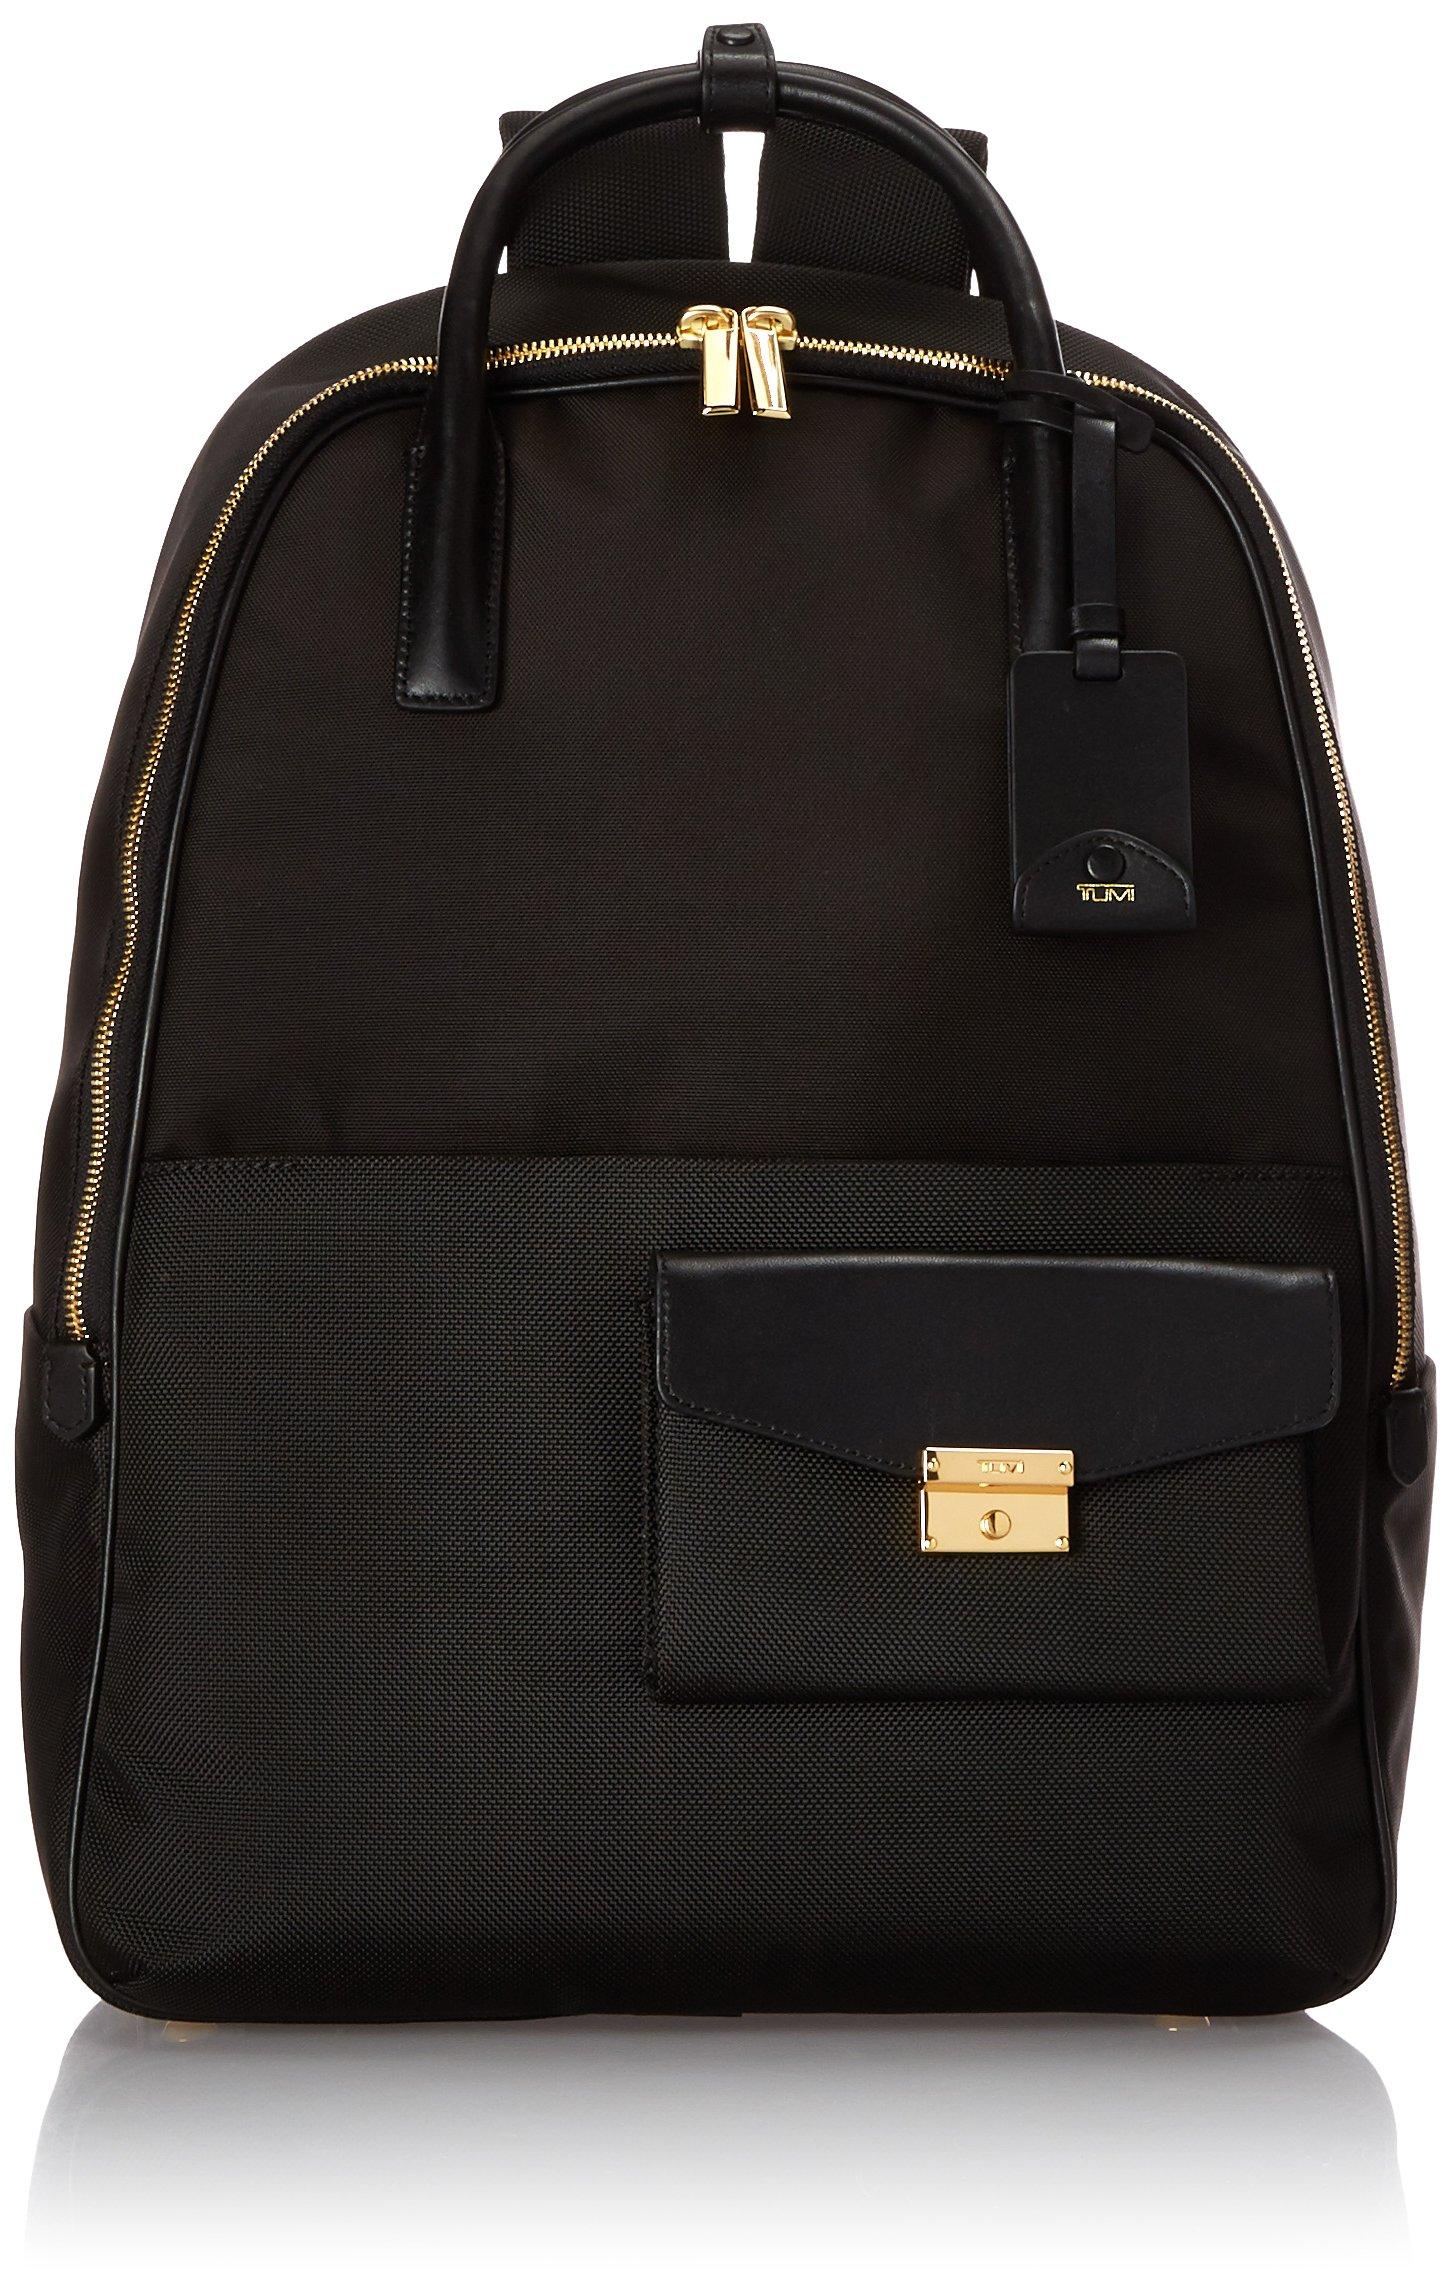 Tumi Larkin Portola Convertible Backpack, Black, One Size